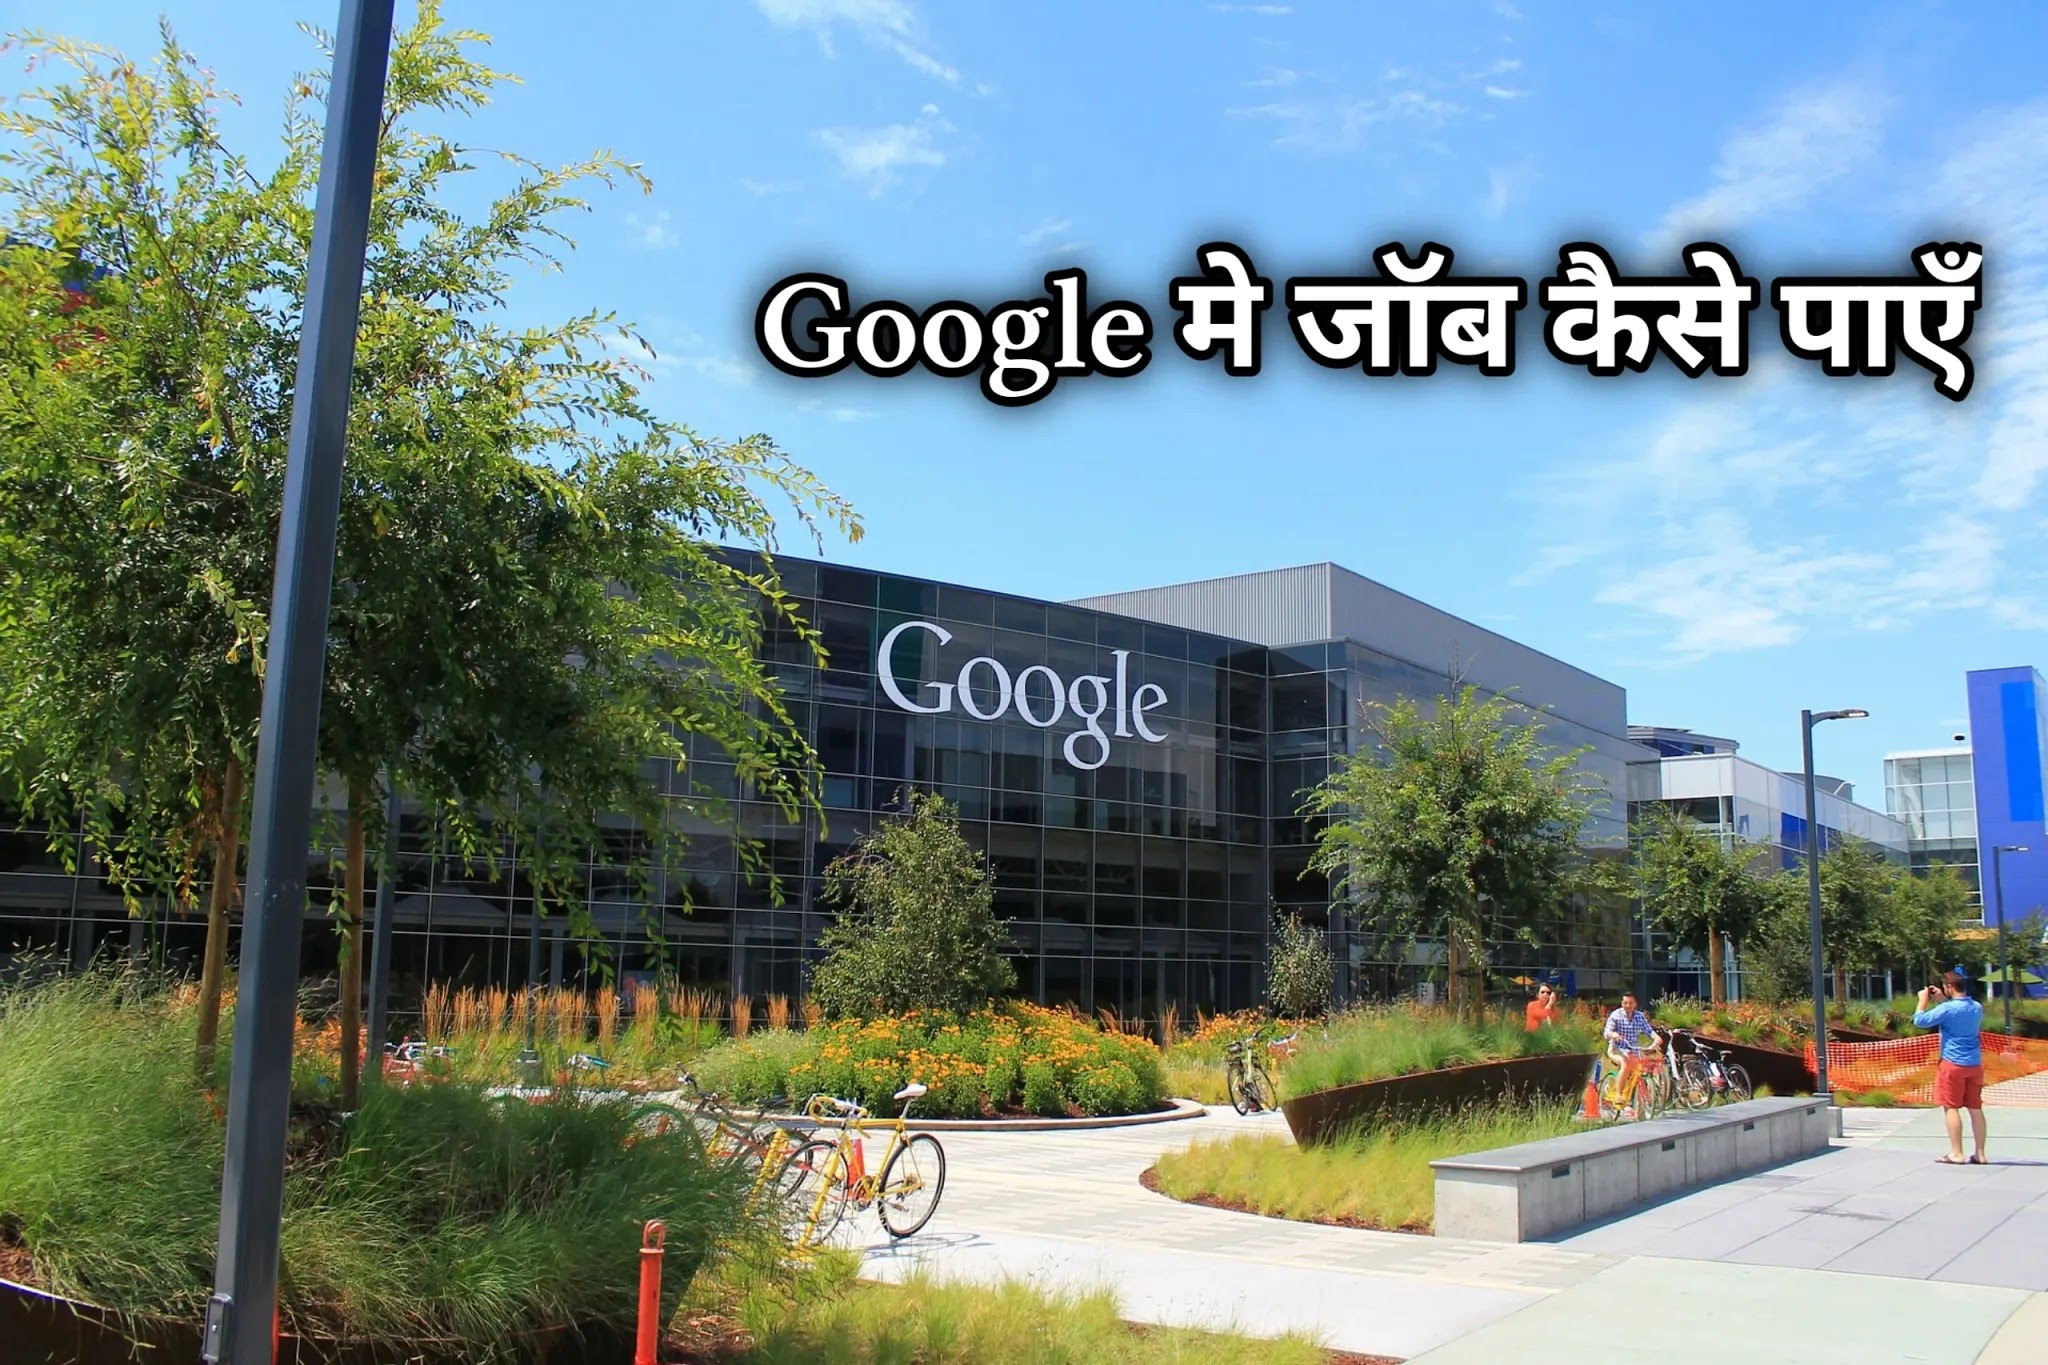 Google मे जॉब कैसे पायें । Google me job kaise payen